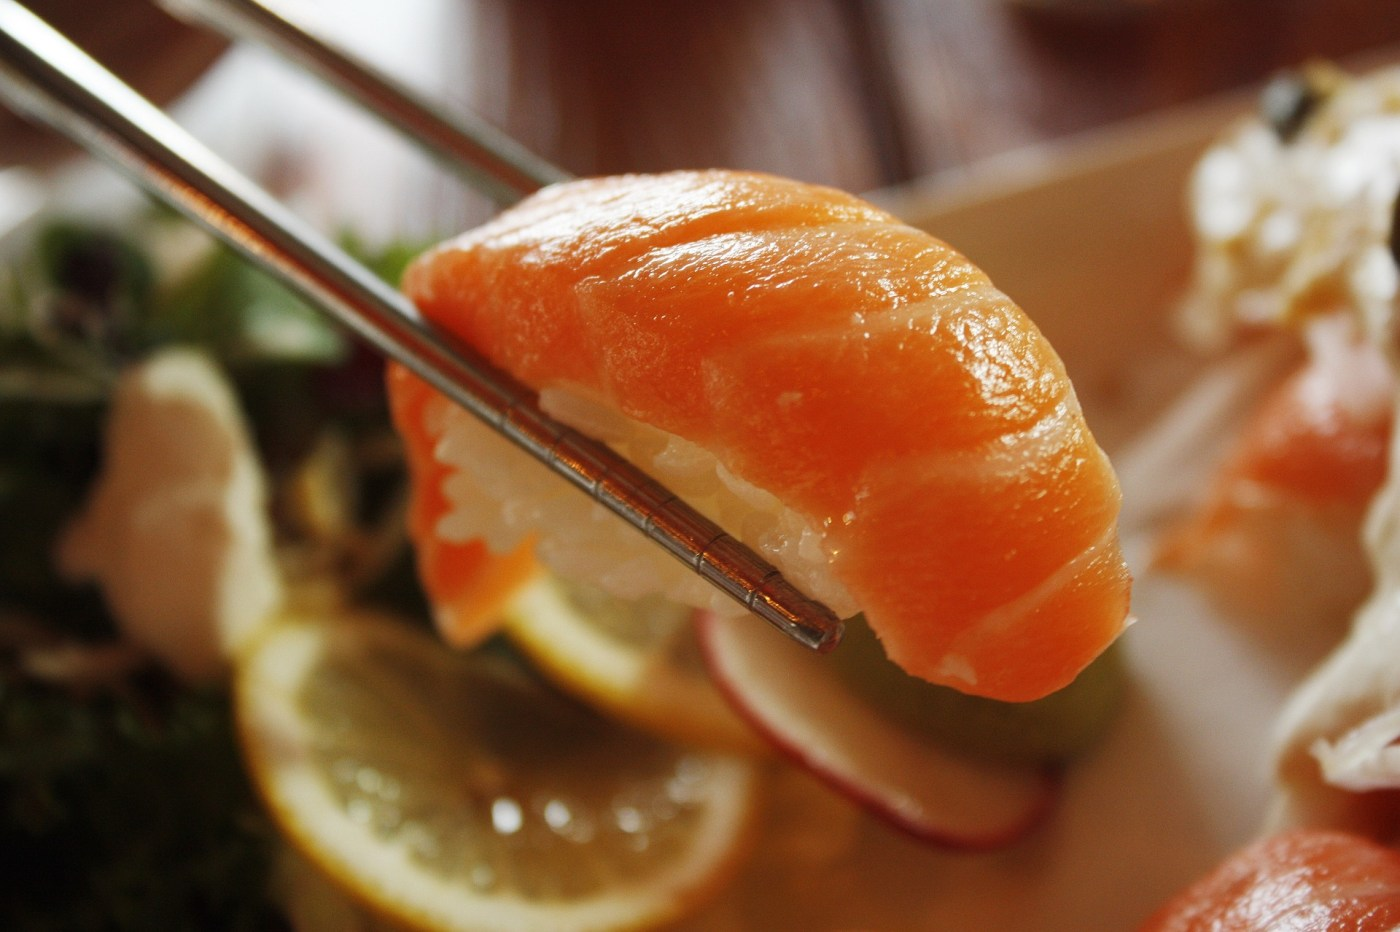 oishi sushi abidjan, cuisine japonaise, abidjan, serialfoodie, blog, blogger, foodie, food, critique cullinaire, côte d'ivoire